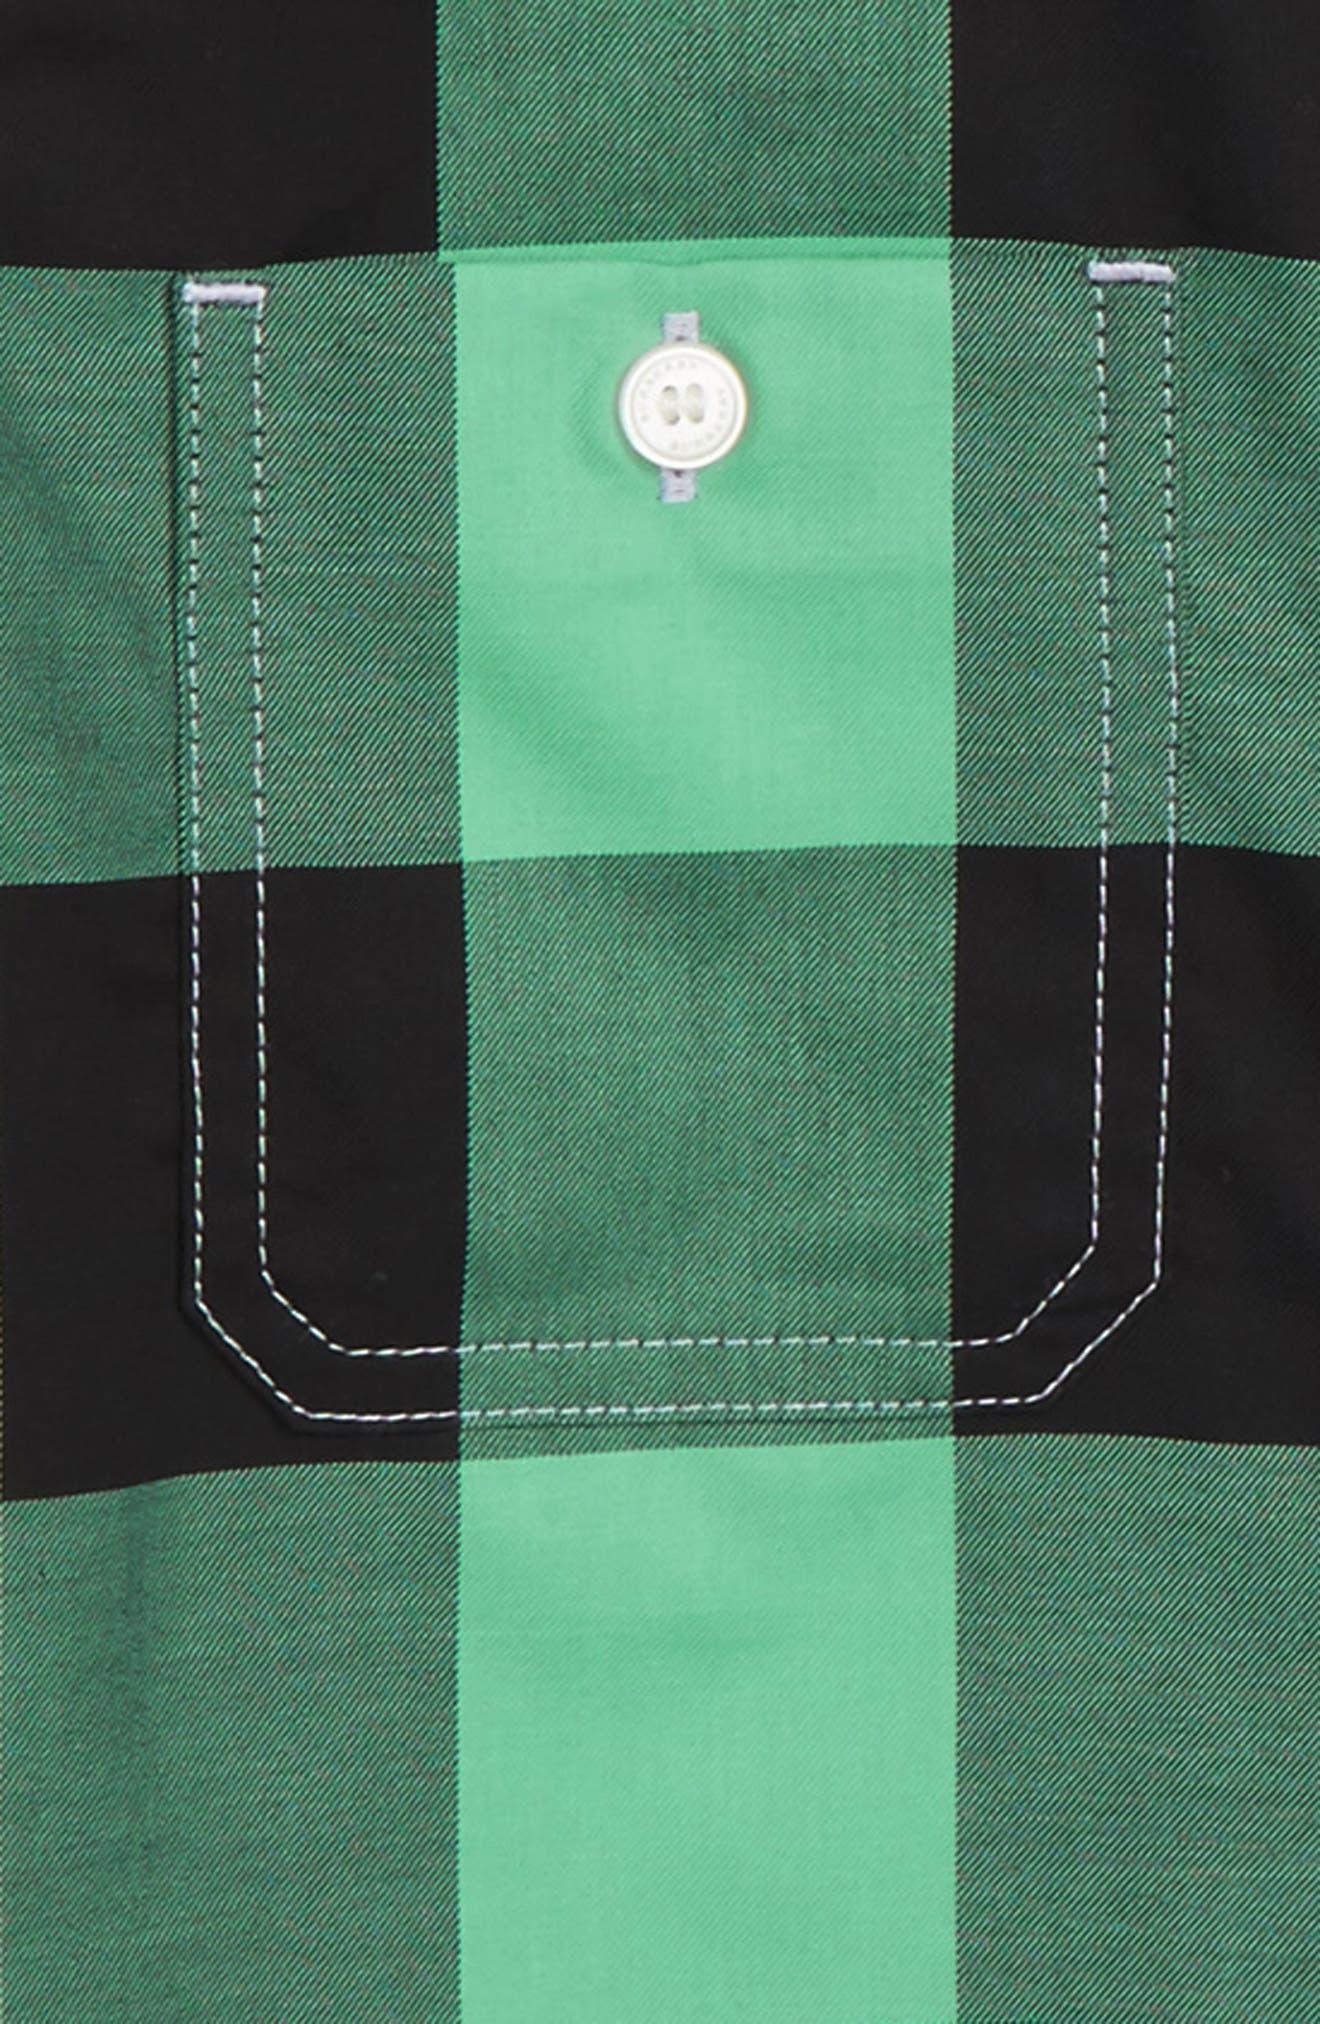 Camber Check Shirt,                             Alternate thumbnail 2, color,                             Pale Lilac